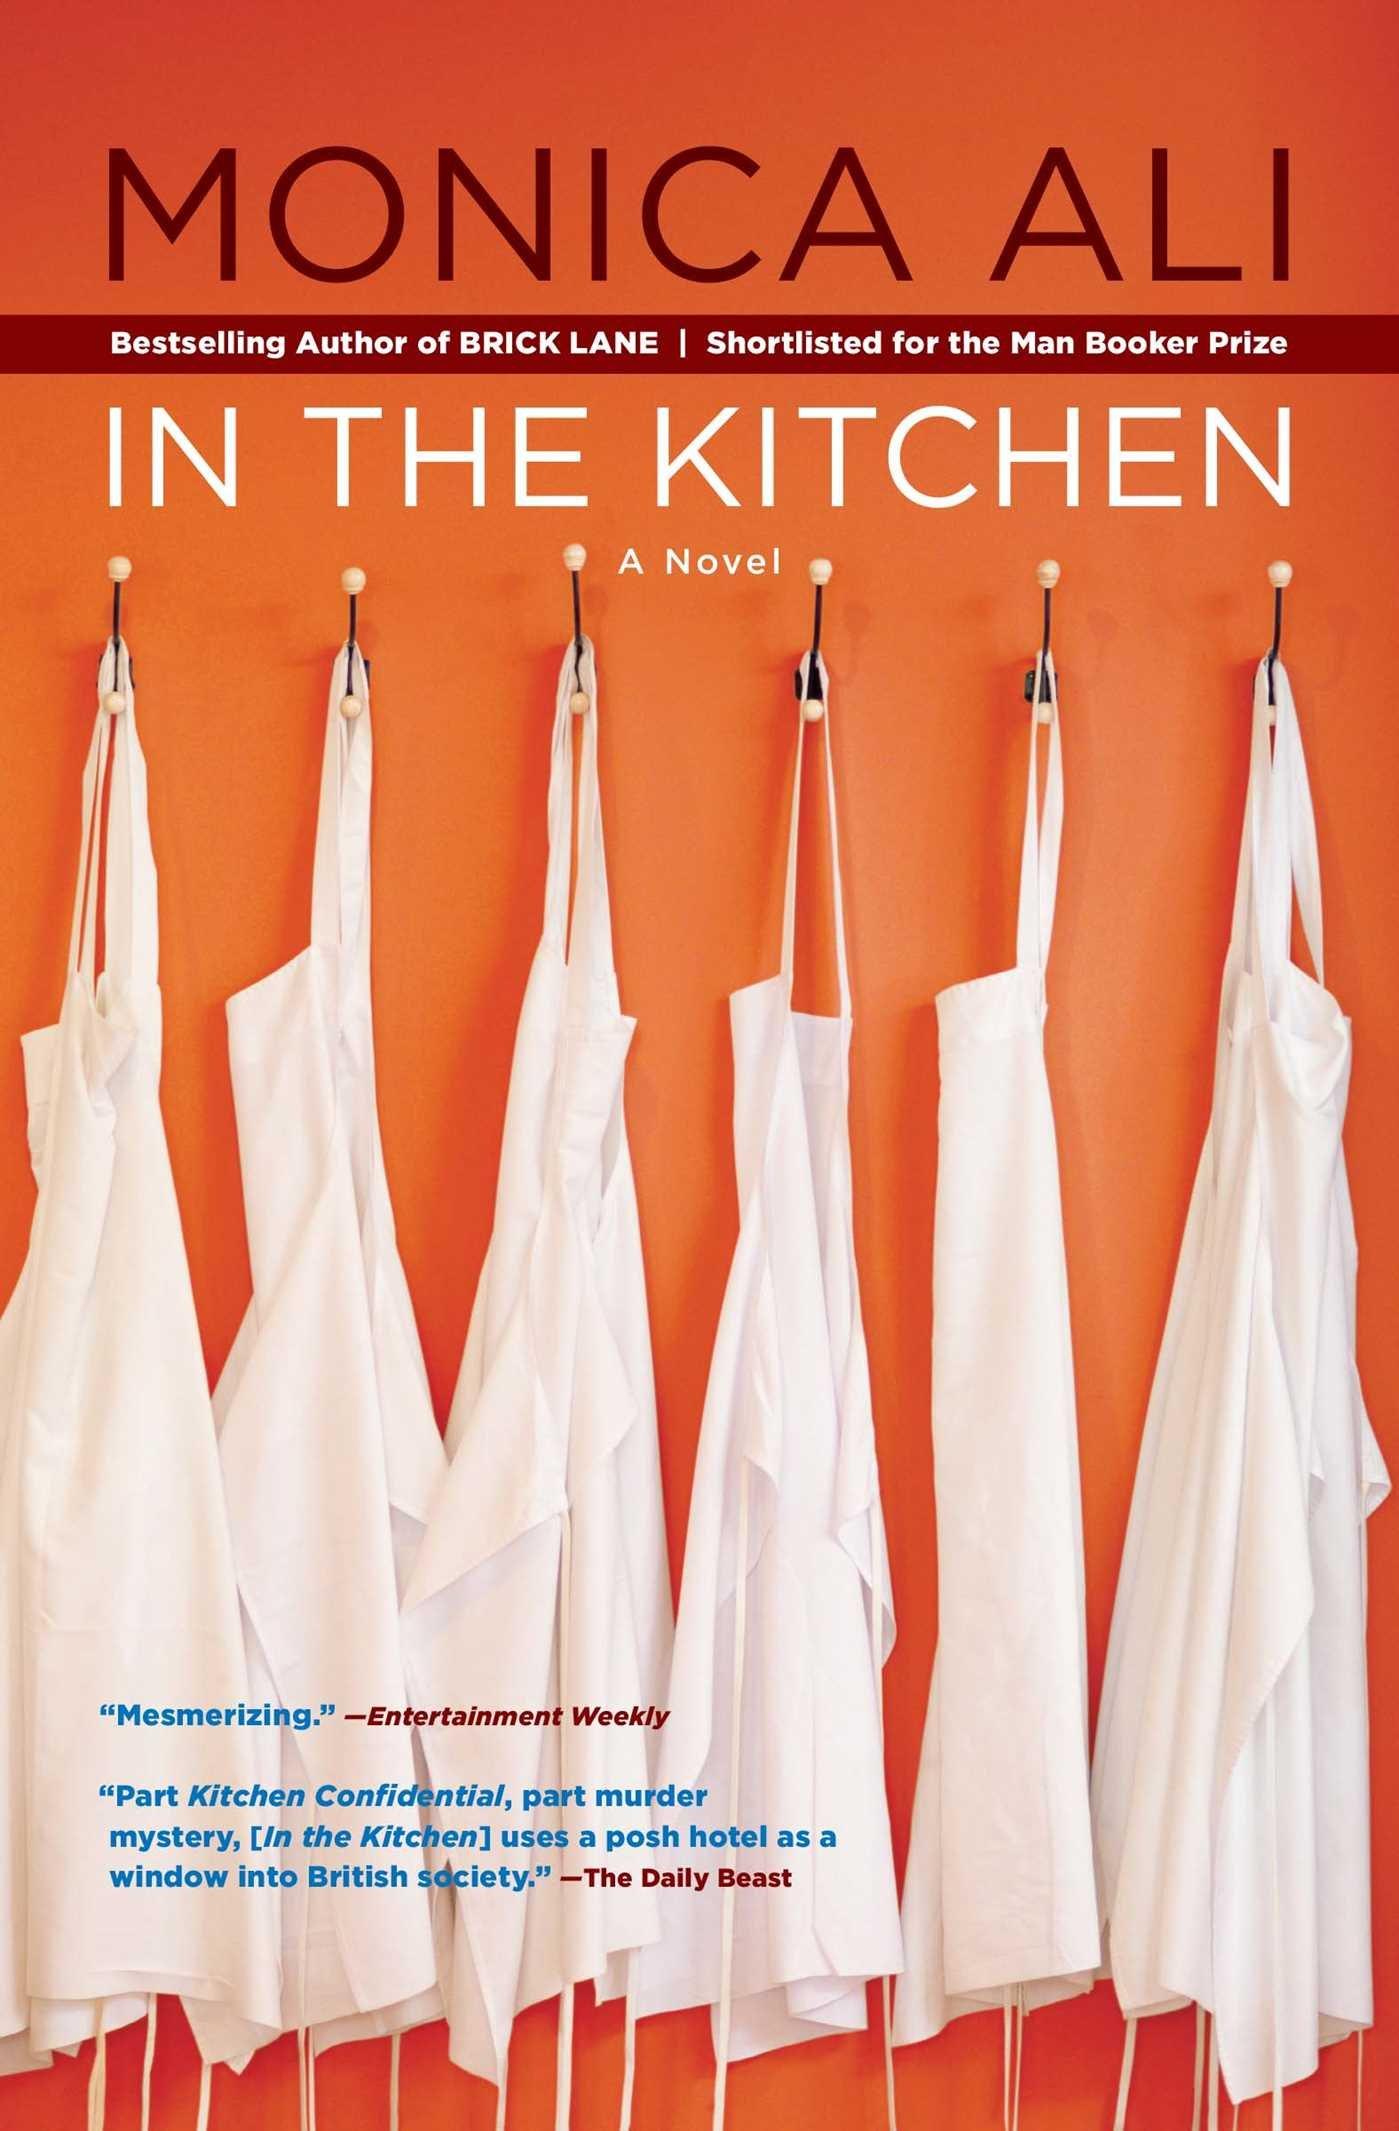 In The Kitchen A Novel Amazon De Ali Monica Fremdsprachige Bücher